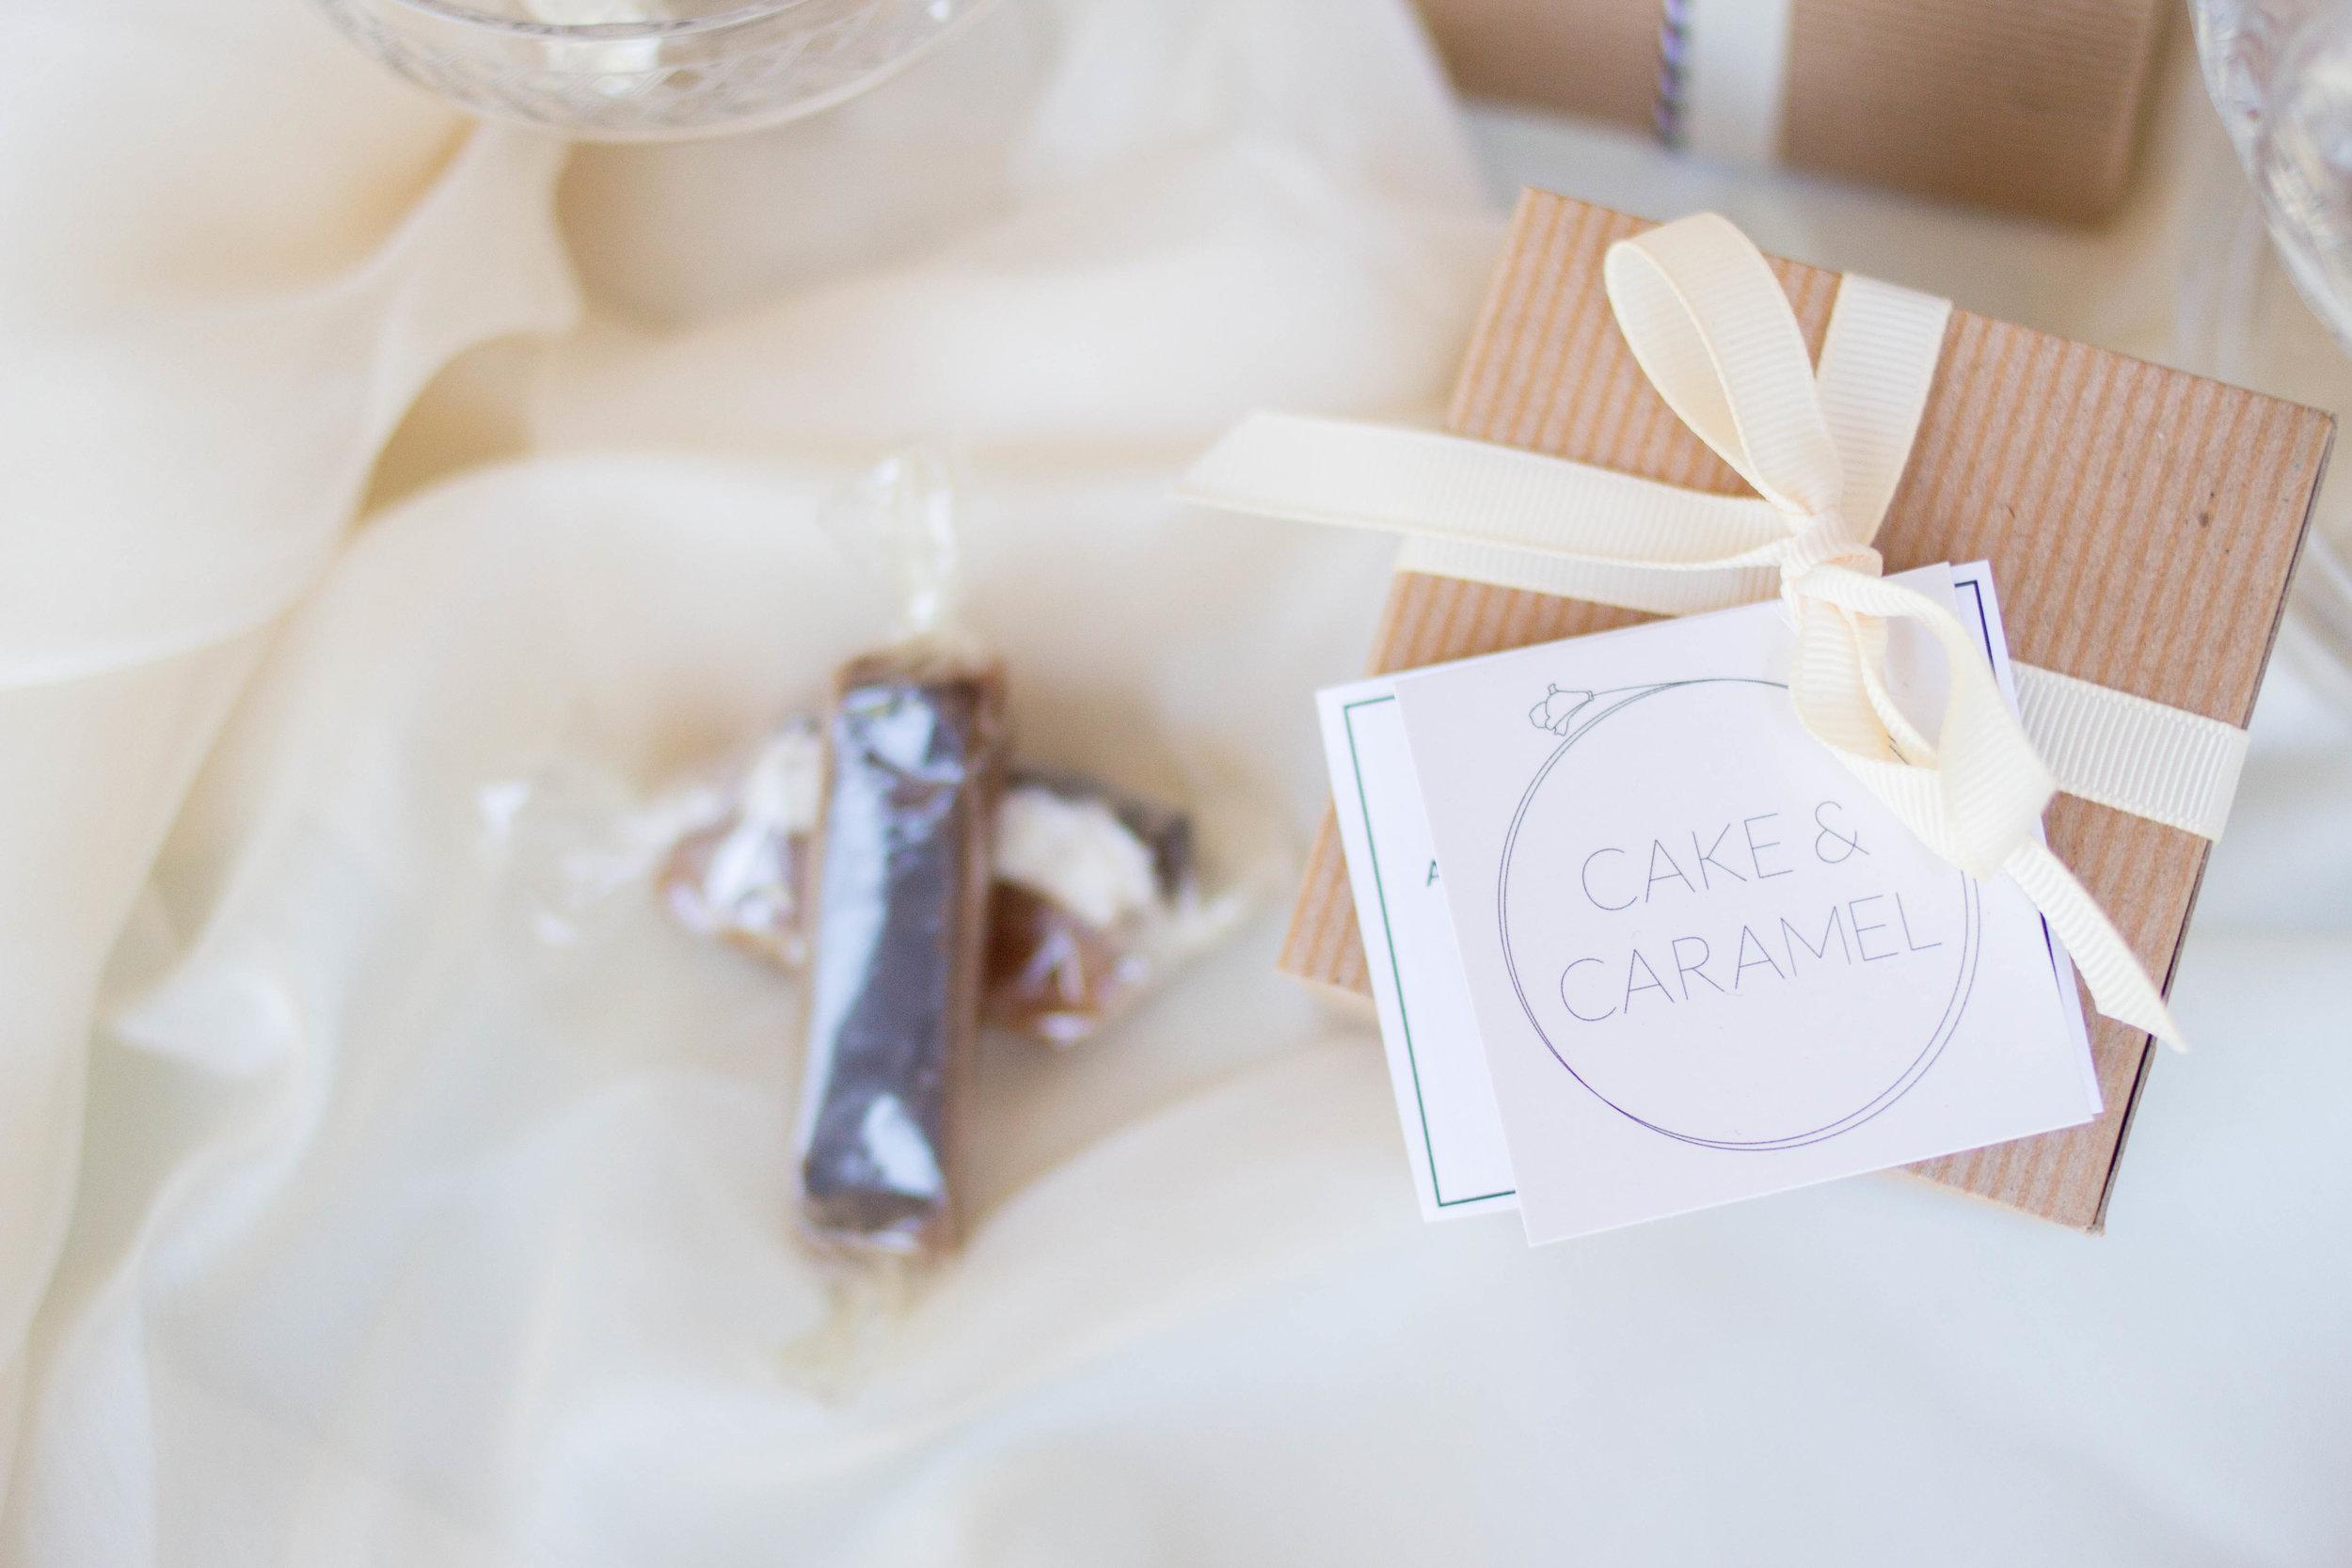 cake and caramel favor